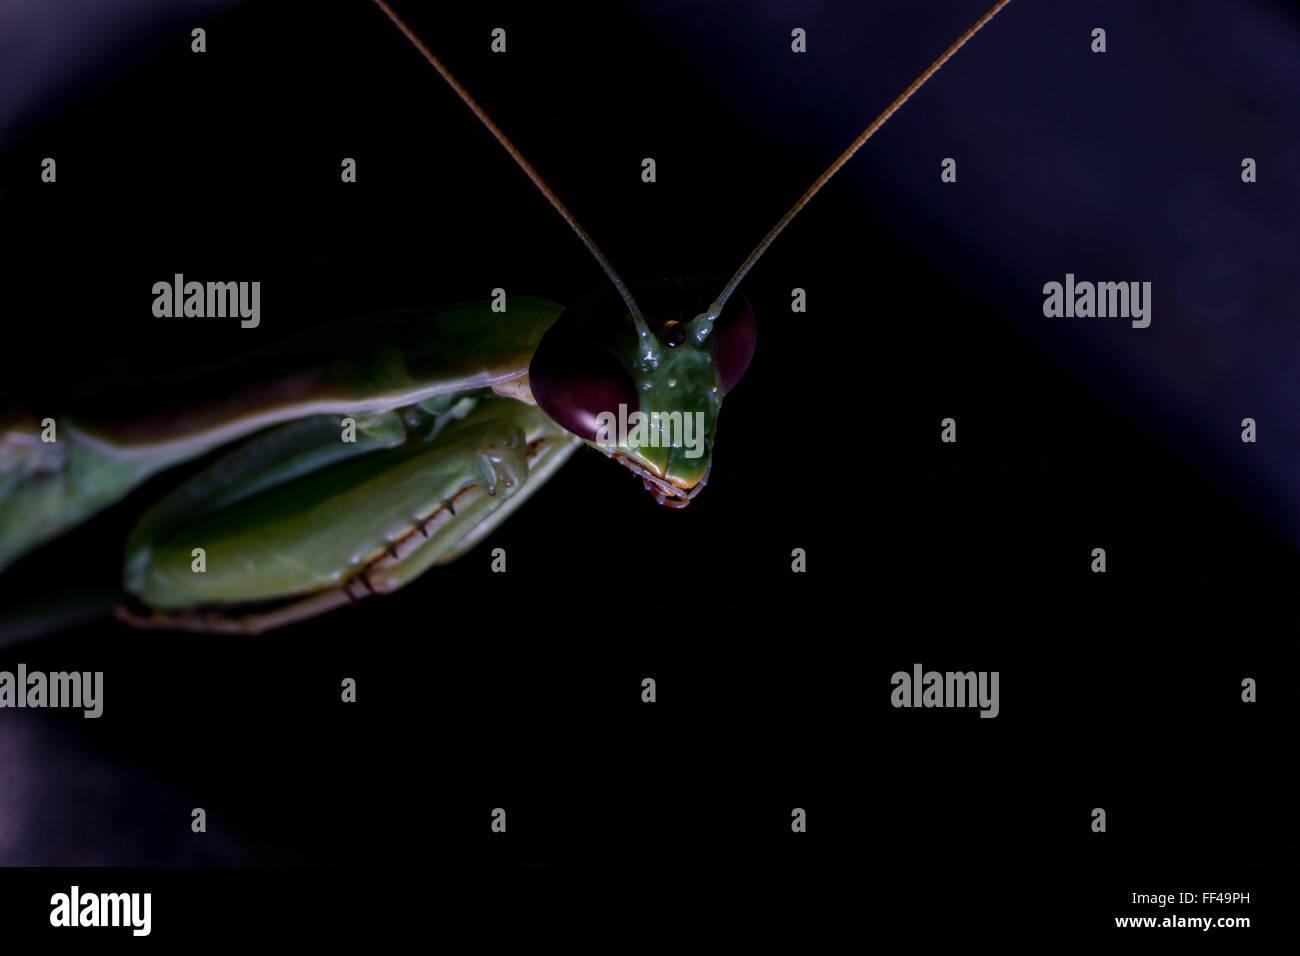 The Alien Mantis - Stock Image